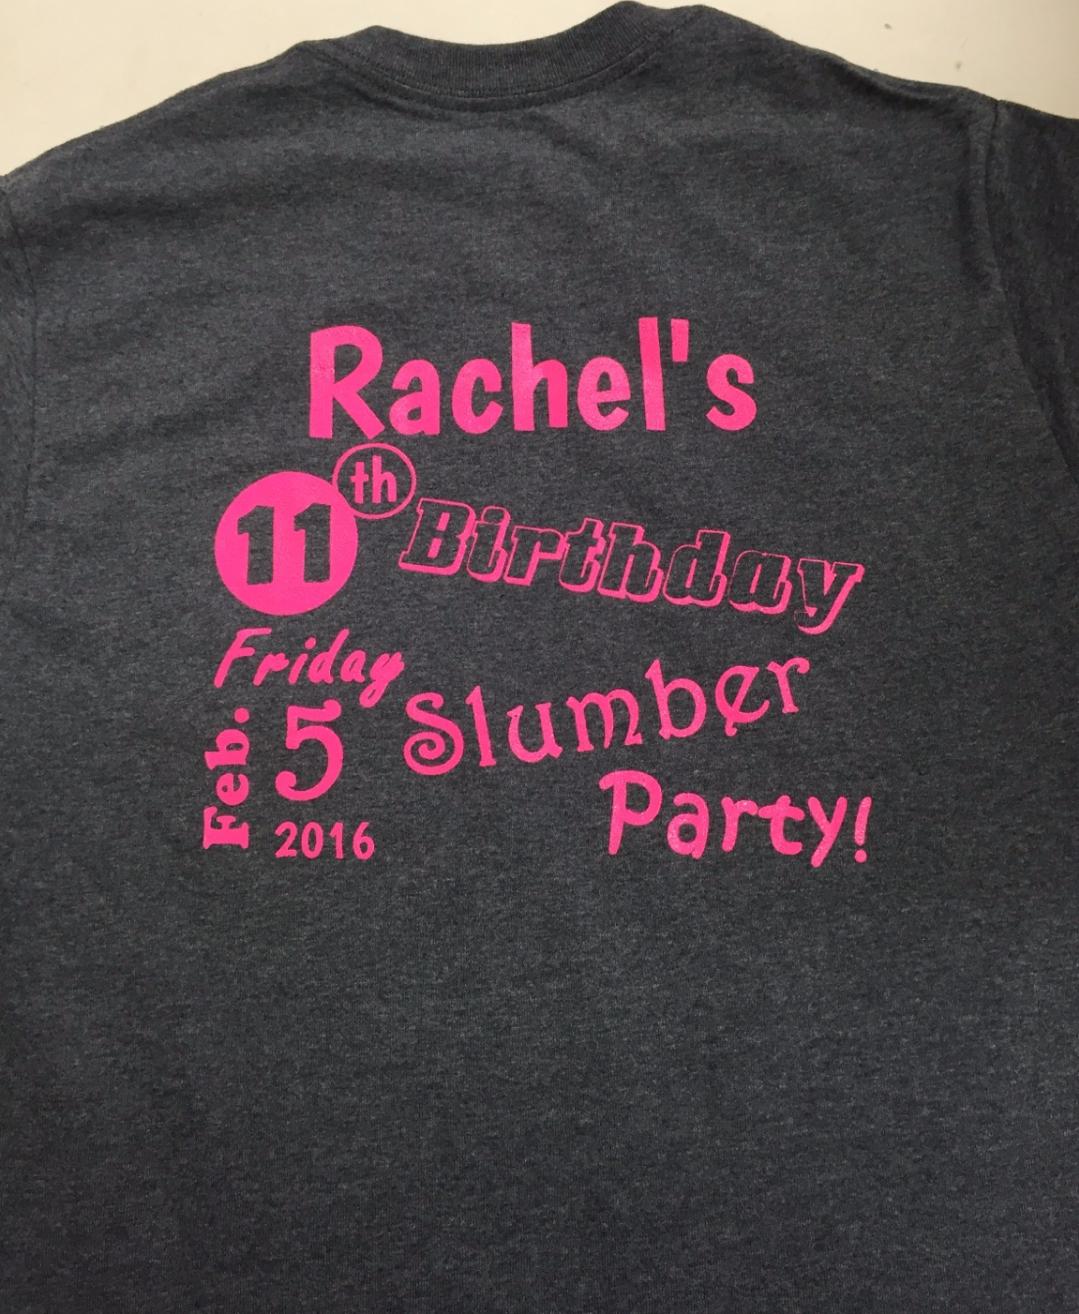 Rachel's Birthday